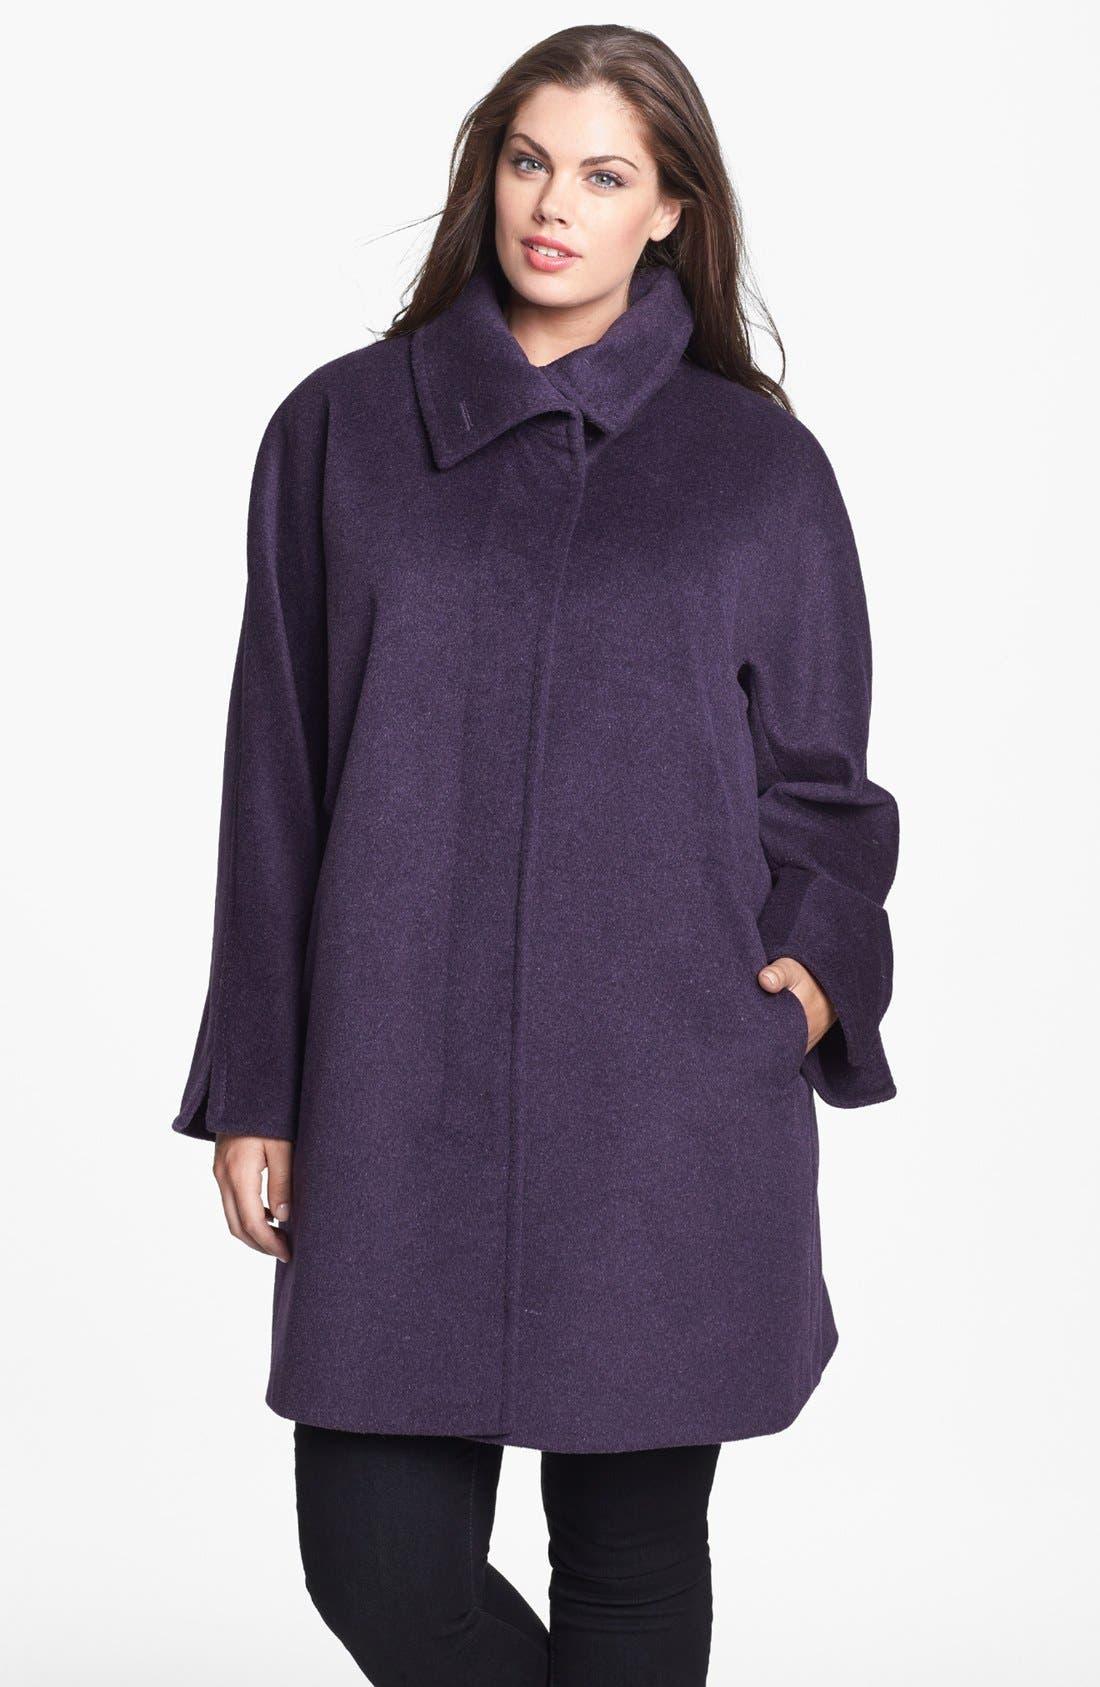 Alternate Image 1 Selected - Ellen Tracy Dolman Sleeve Topper (Plus Size)